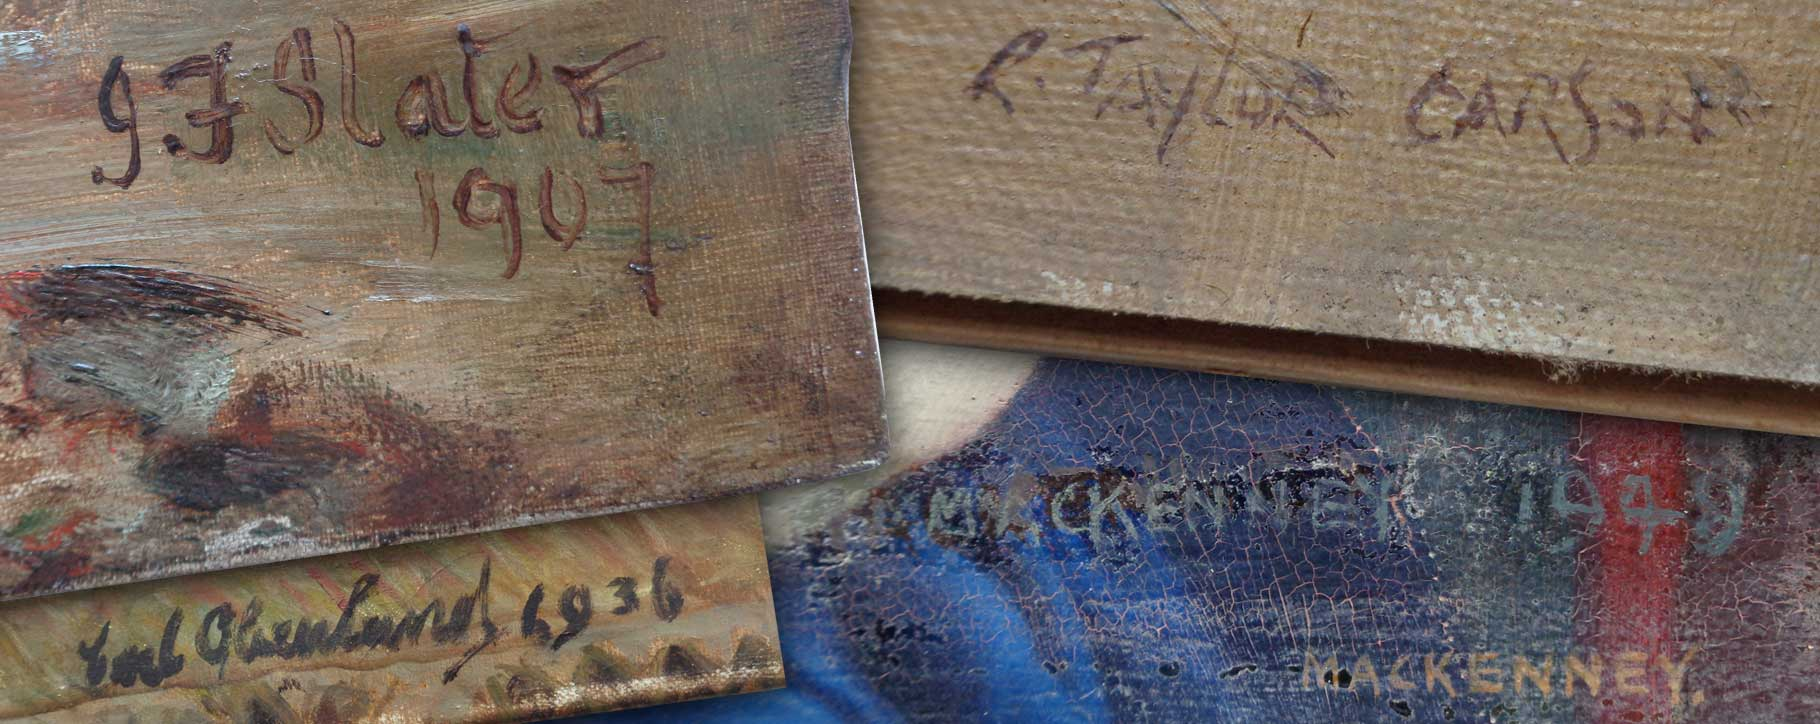 Oil painting signatures